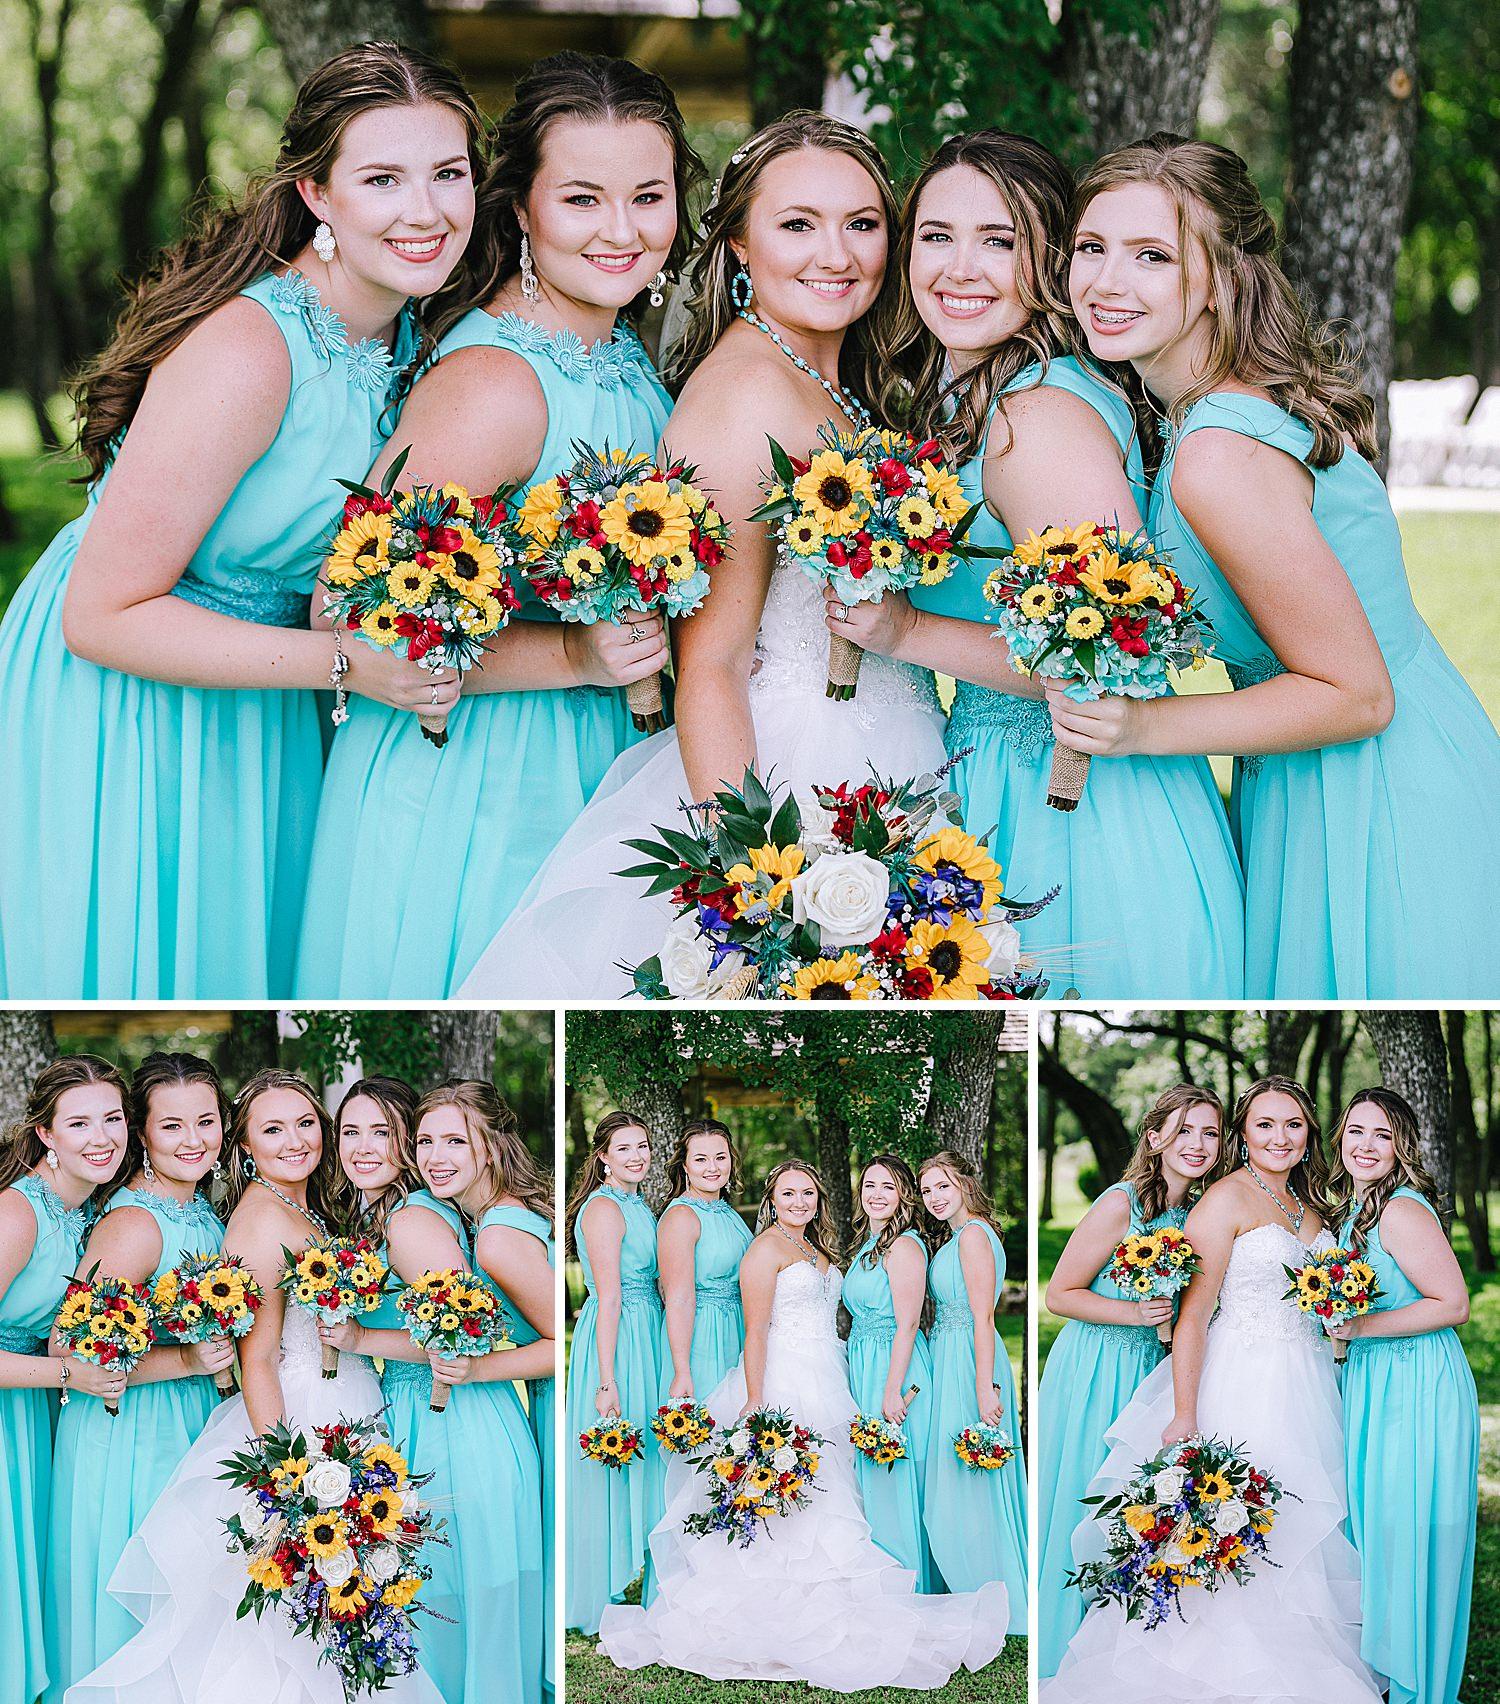 Carly-Barton-Photography-Old-Town-Texas-Rustic-Wedding-Photos-Sunflowers-Boots-Kyle-Texas_0054.jpg